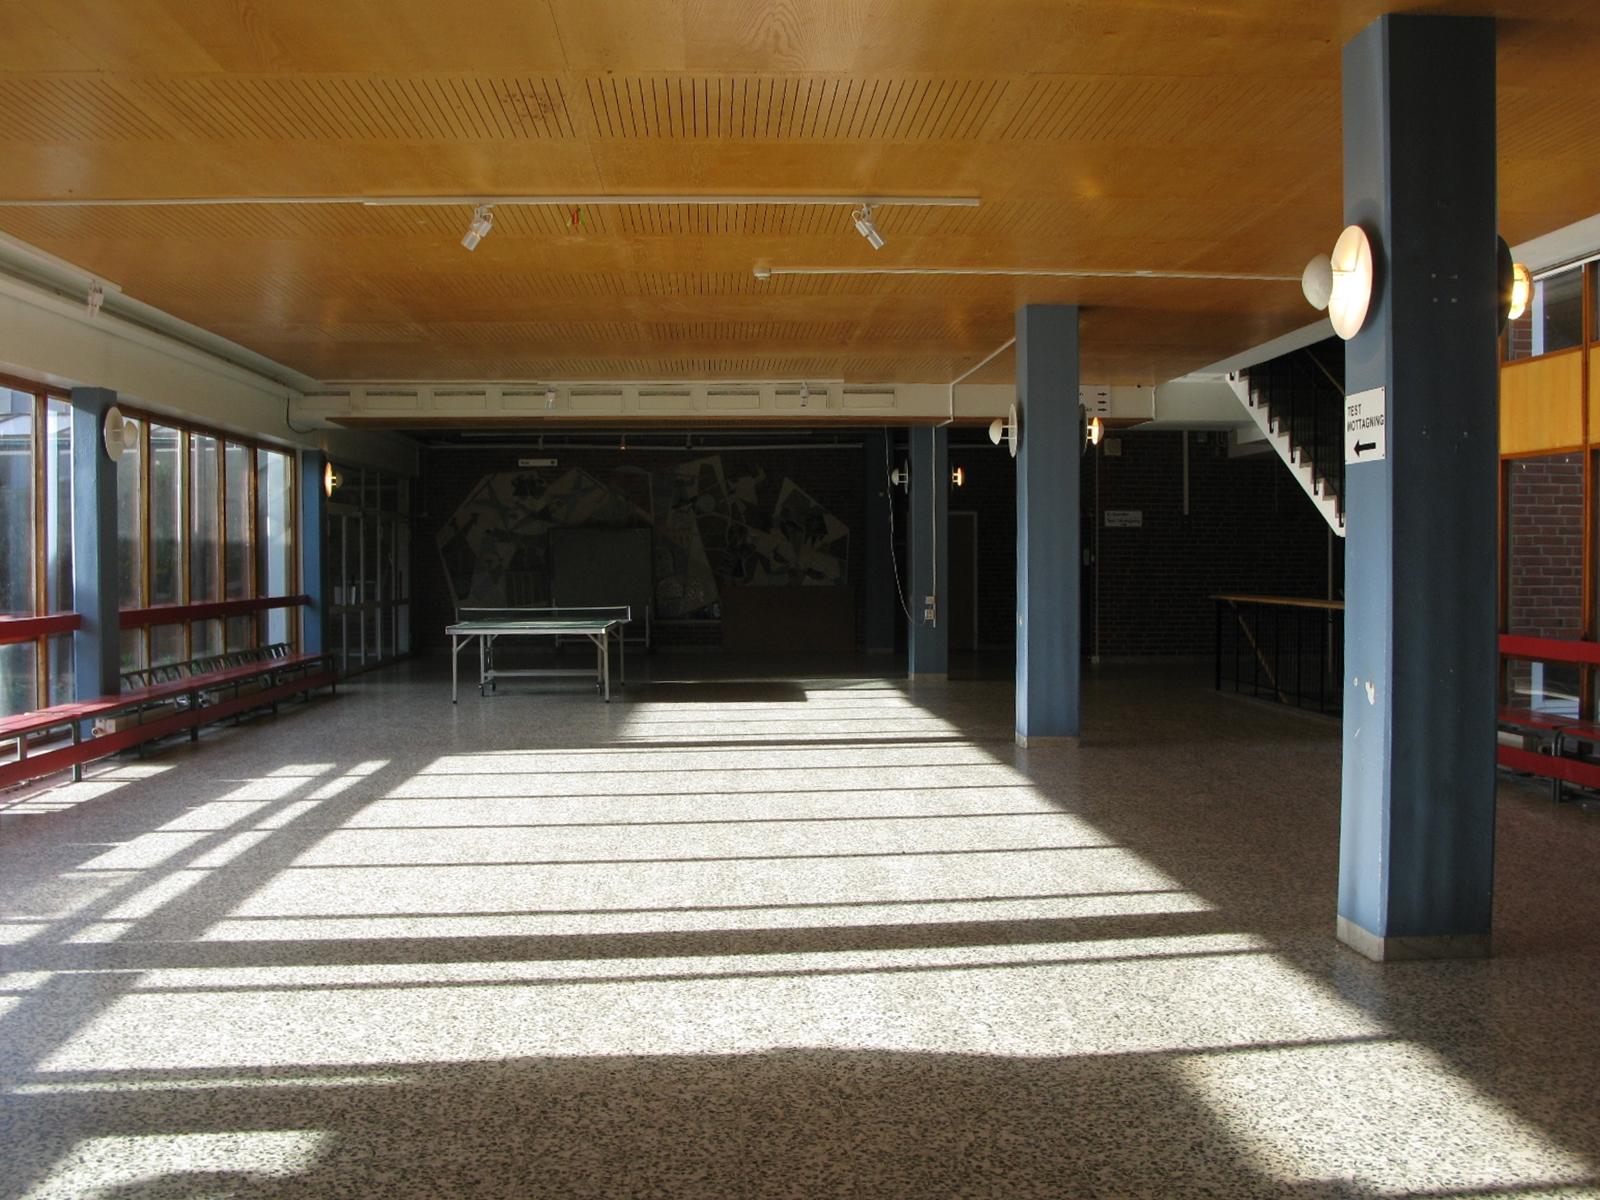 Nostalgorama: lundby gymnasium i göteborg